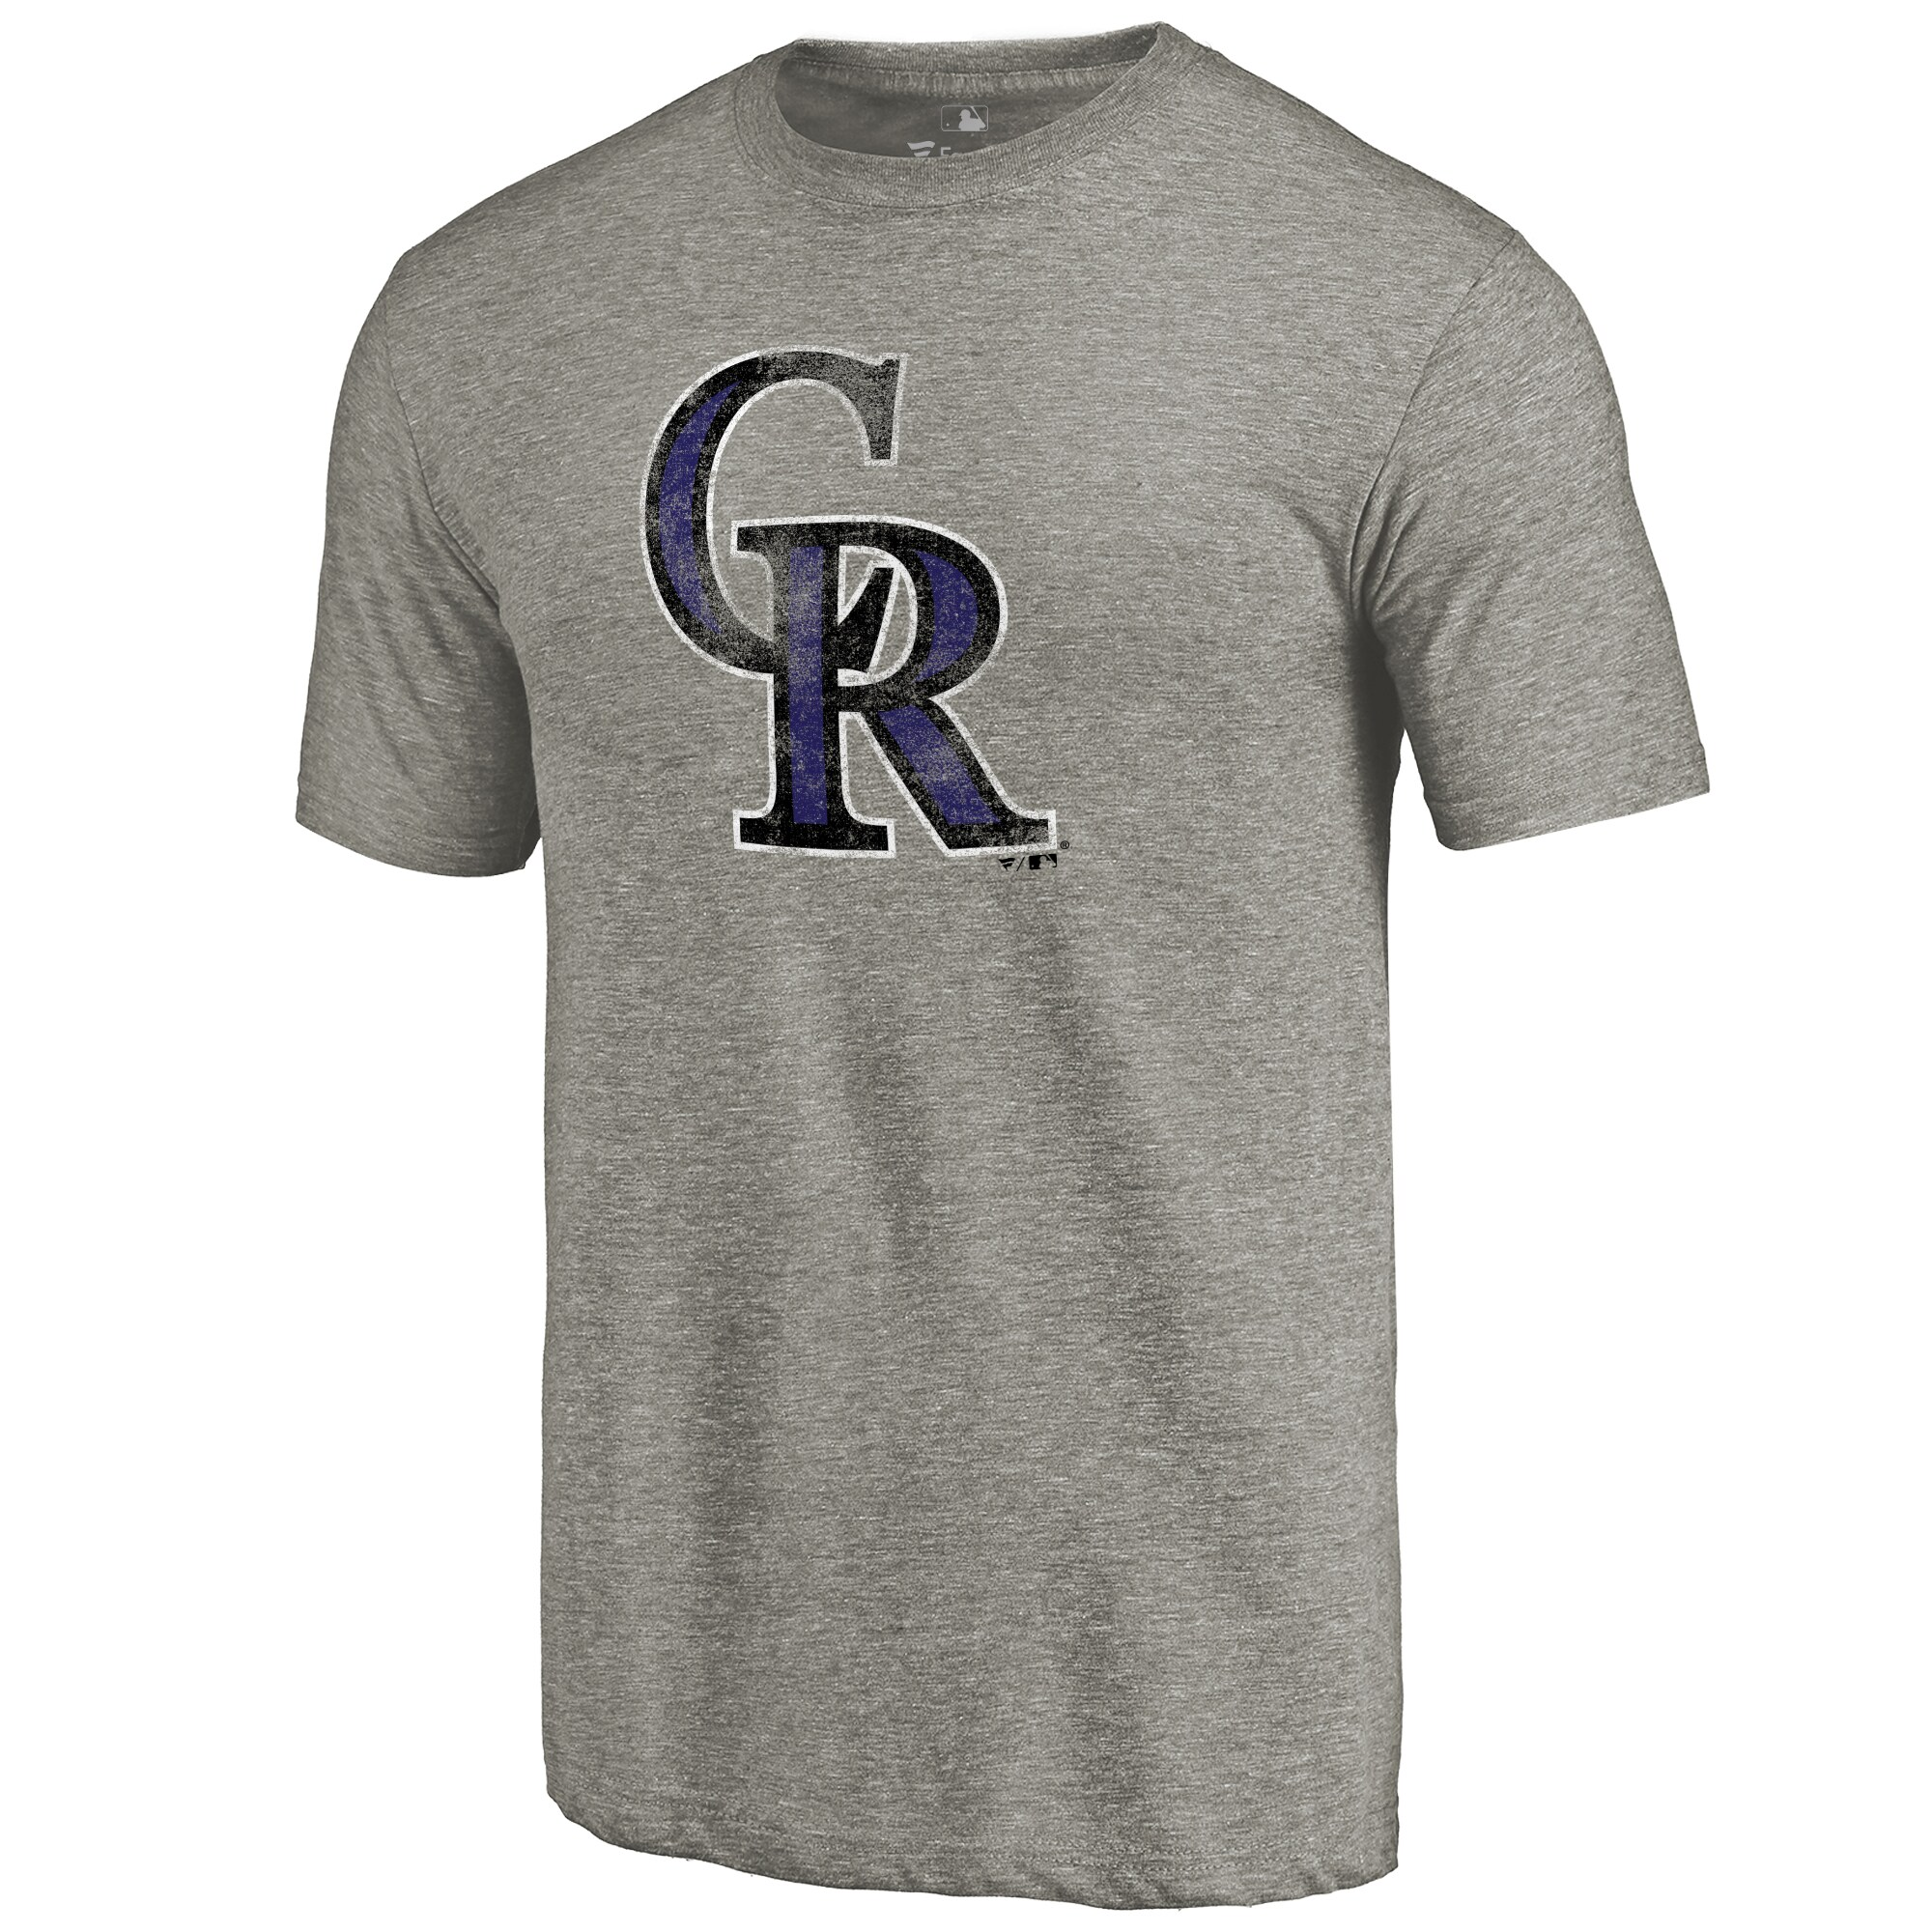 Colorado Rockies Distressed Team Tri-Blend T-Shirt - Ash